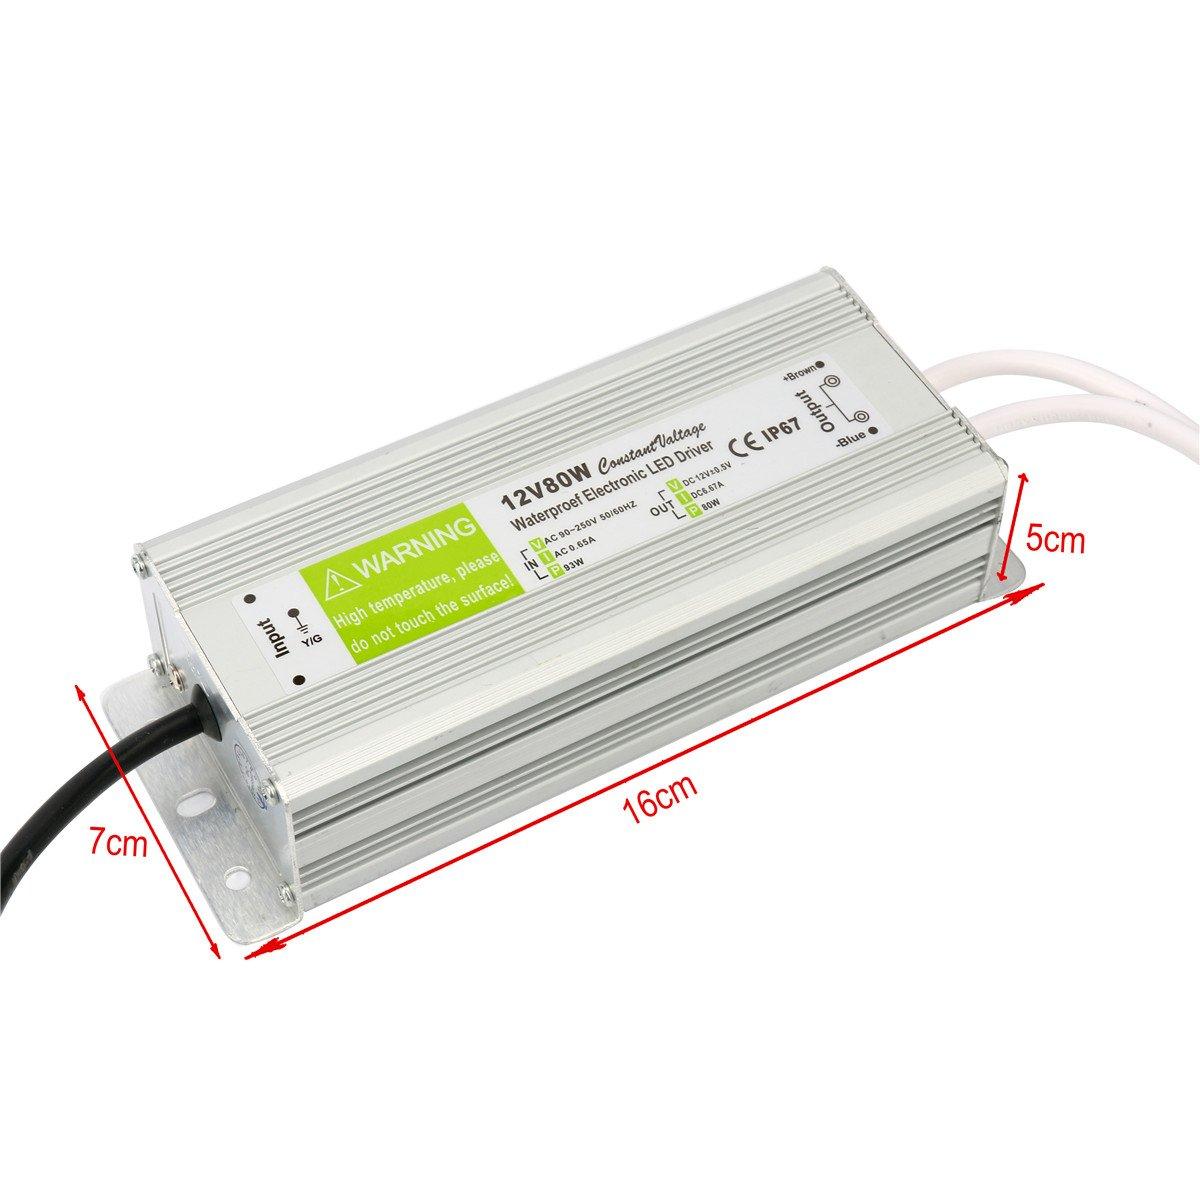 Yaetek AC 90-250V to DC12V 80W Transformer IP67 Waterproof Electronic LED Driver Power Supply